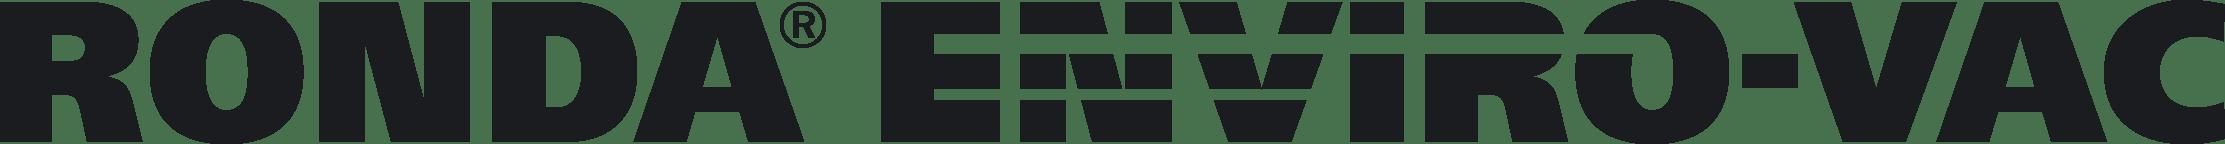 Ronda Enviro Vac Logo